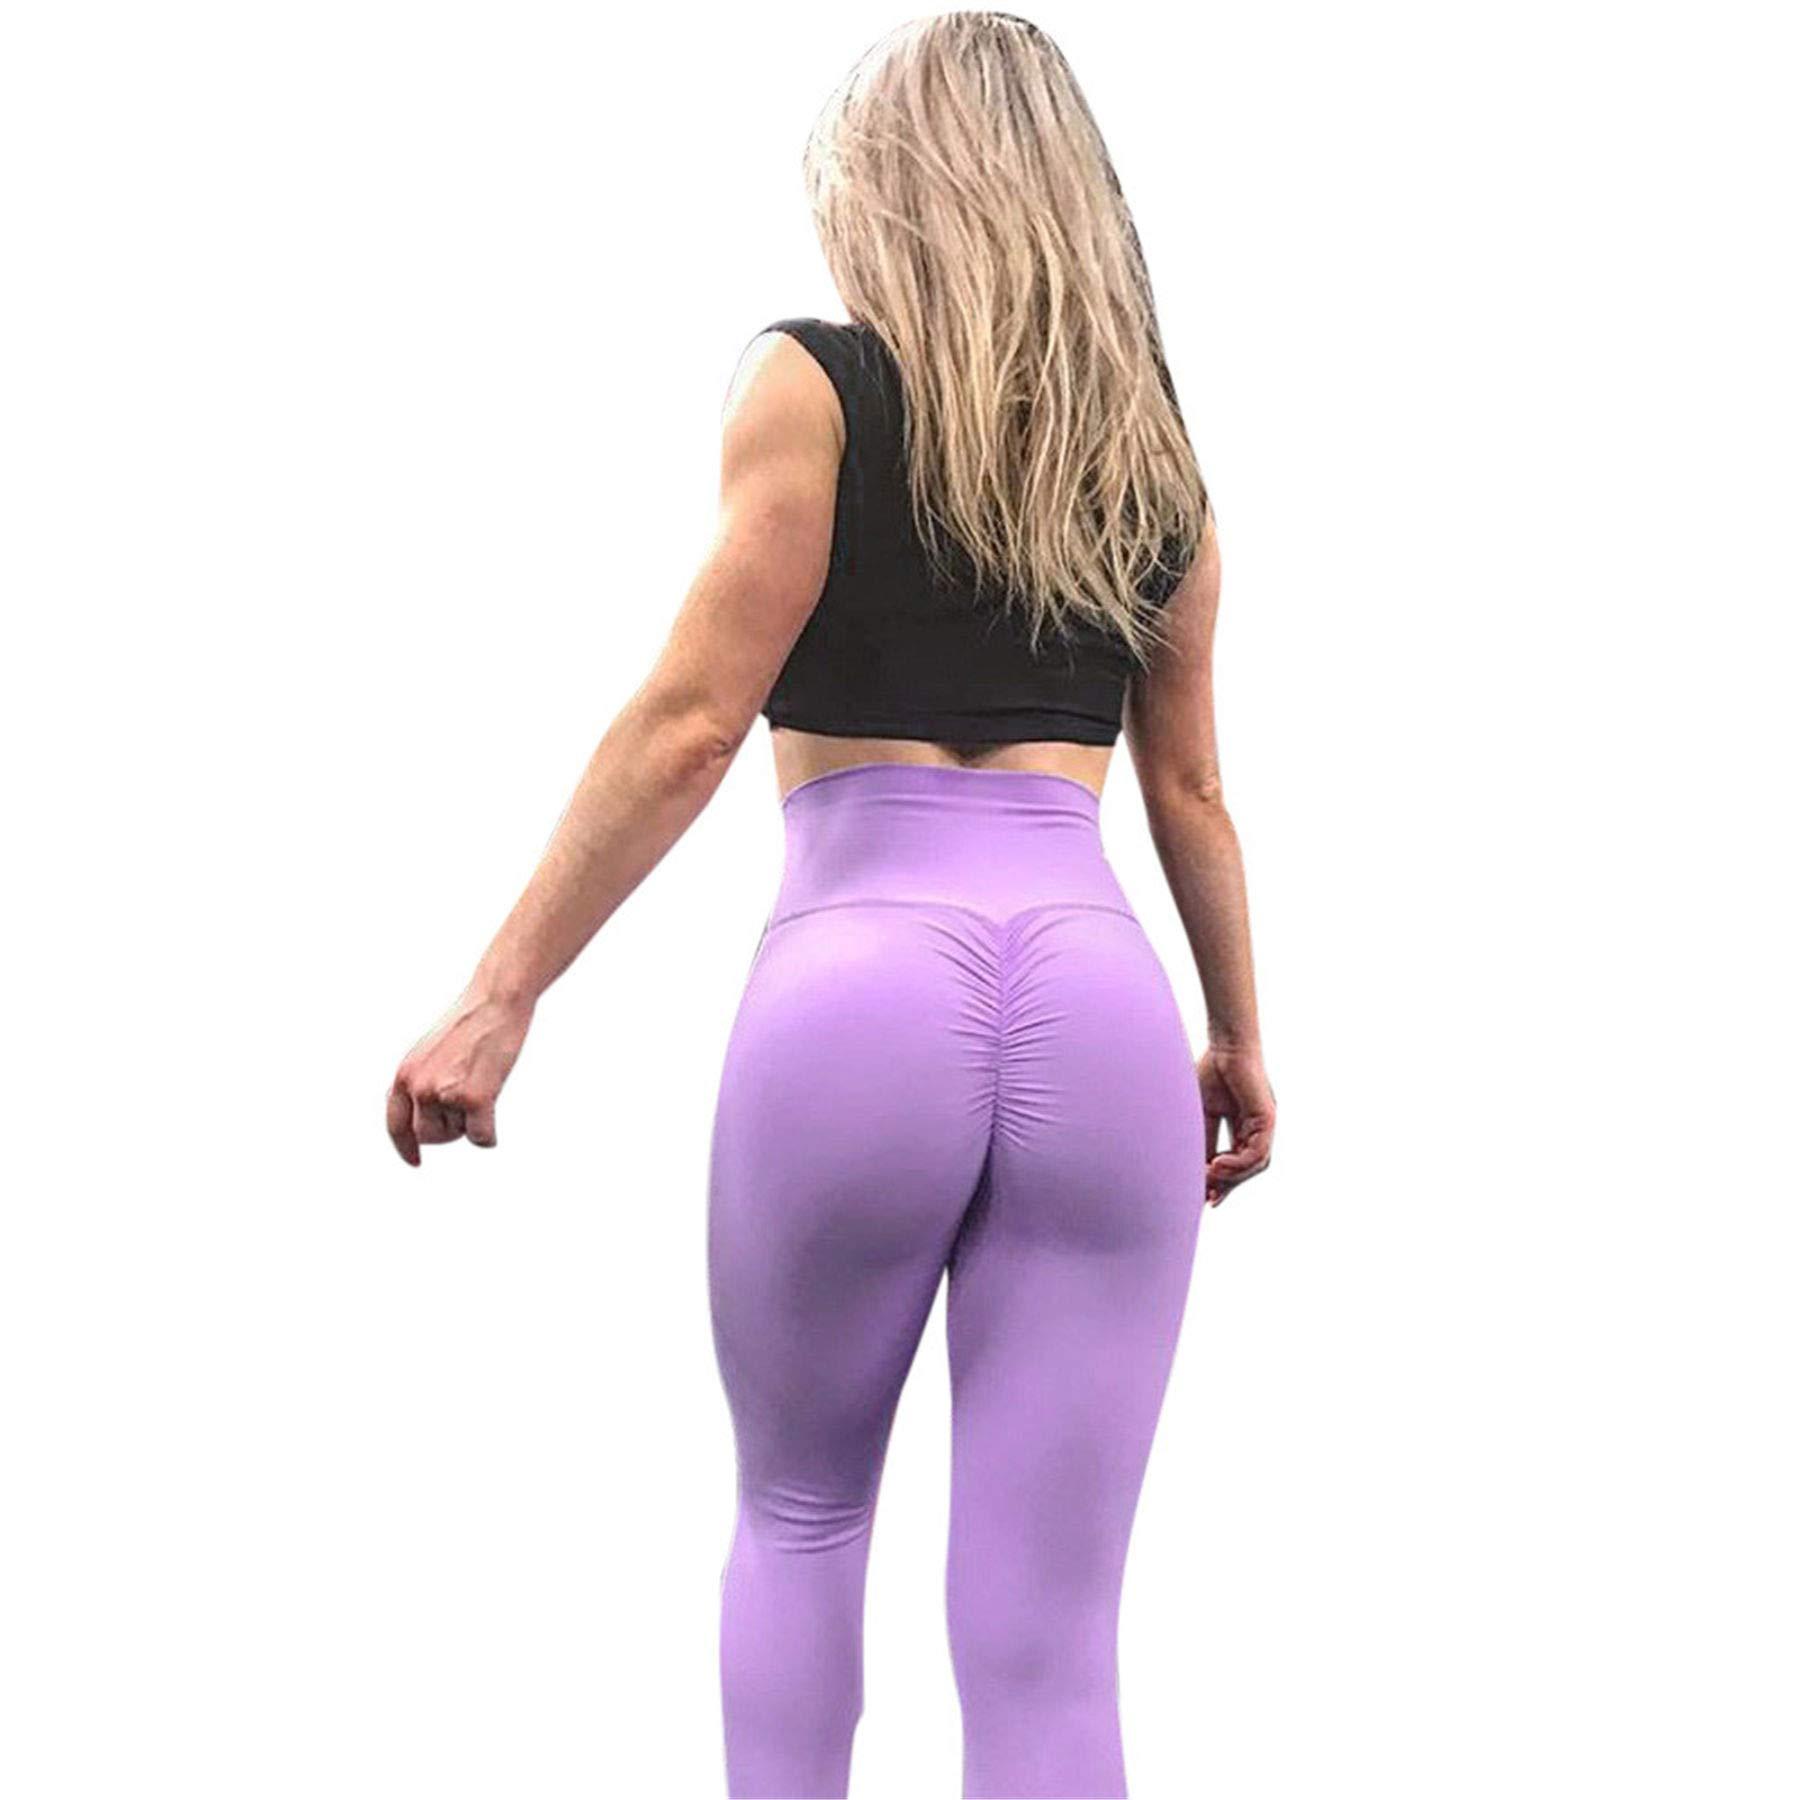 pengchengxinmiao Women Yoga Fitness Pants Abdomen Hips Leggings Sports Activewear Slim Solid Running Athletic Riding Trousers Purple